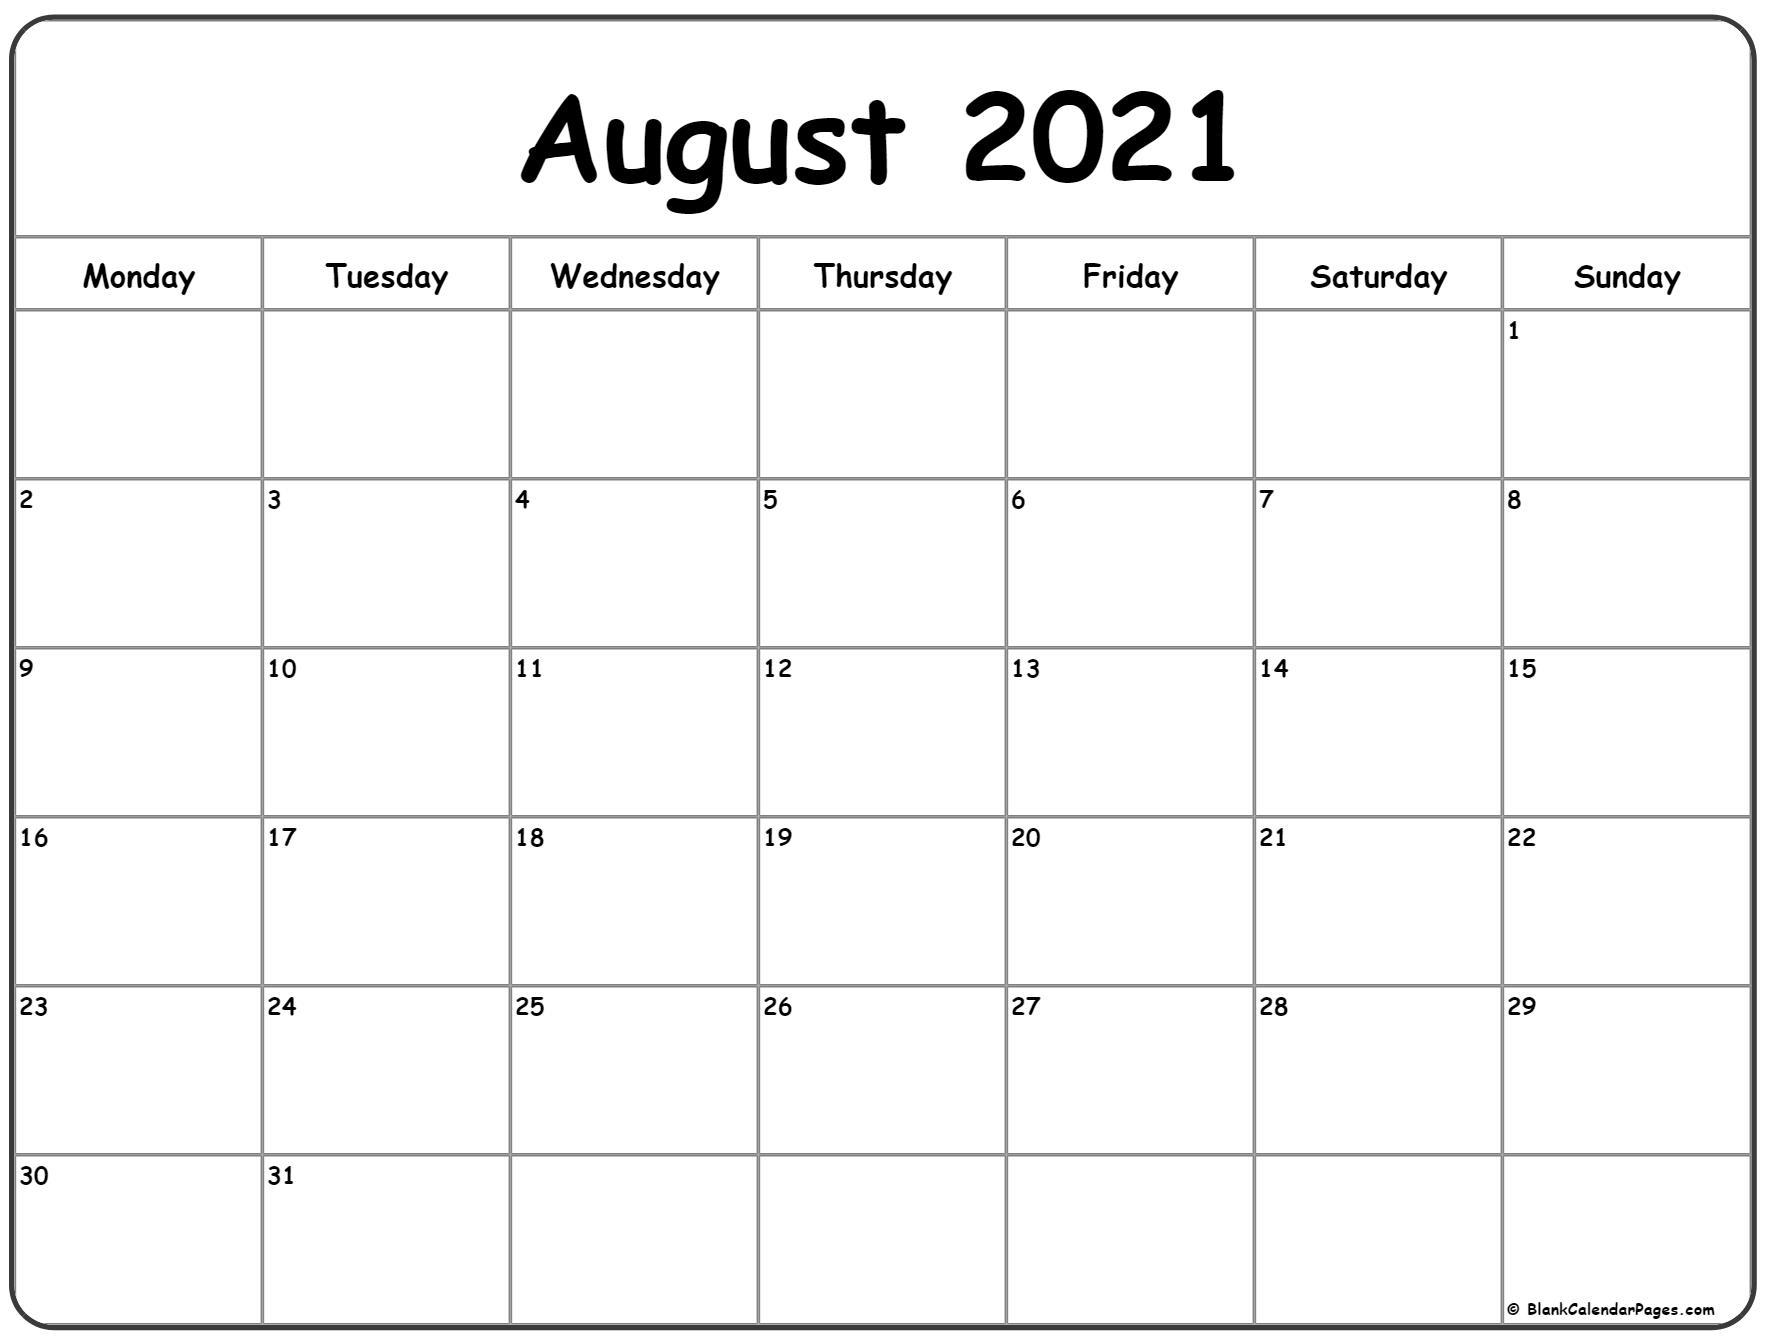 Catch August 2021 Printable Calendar